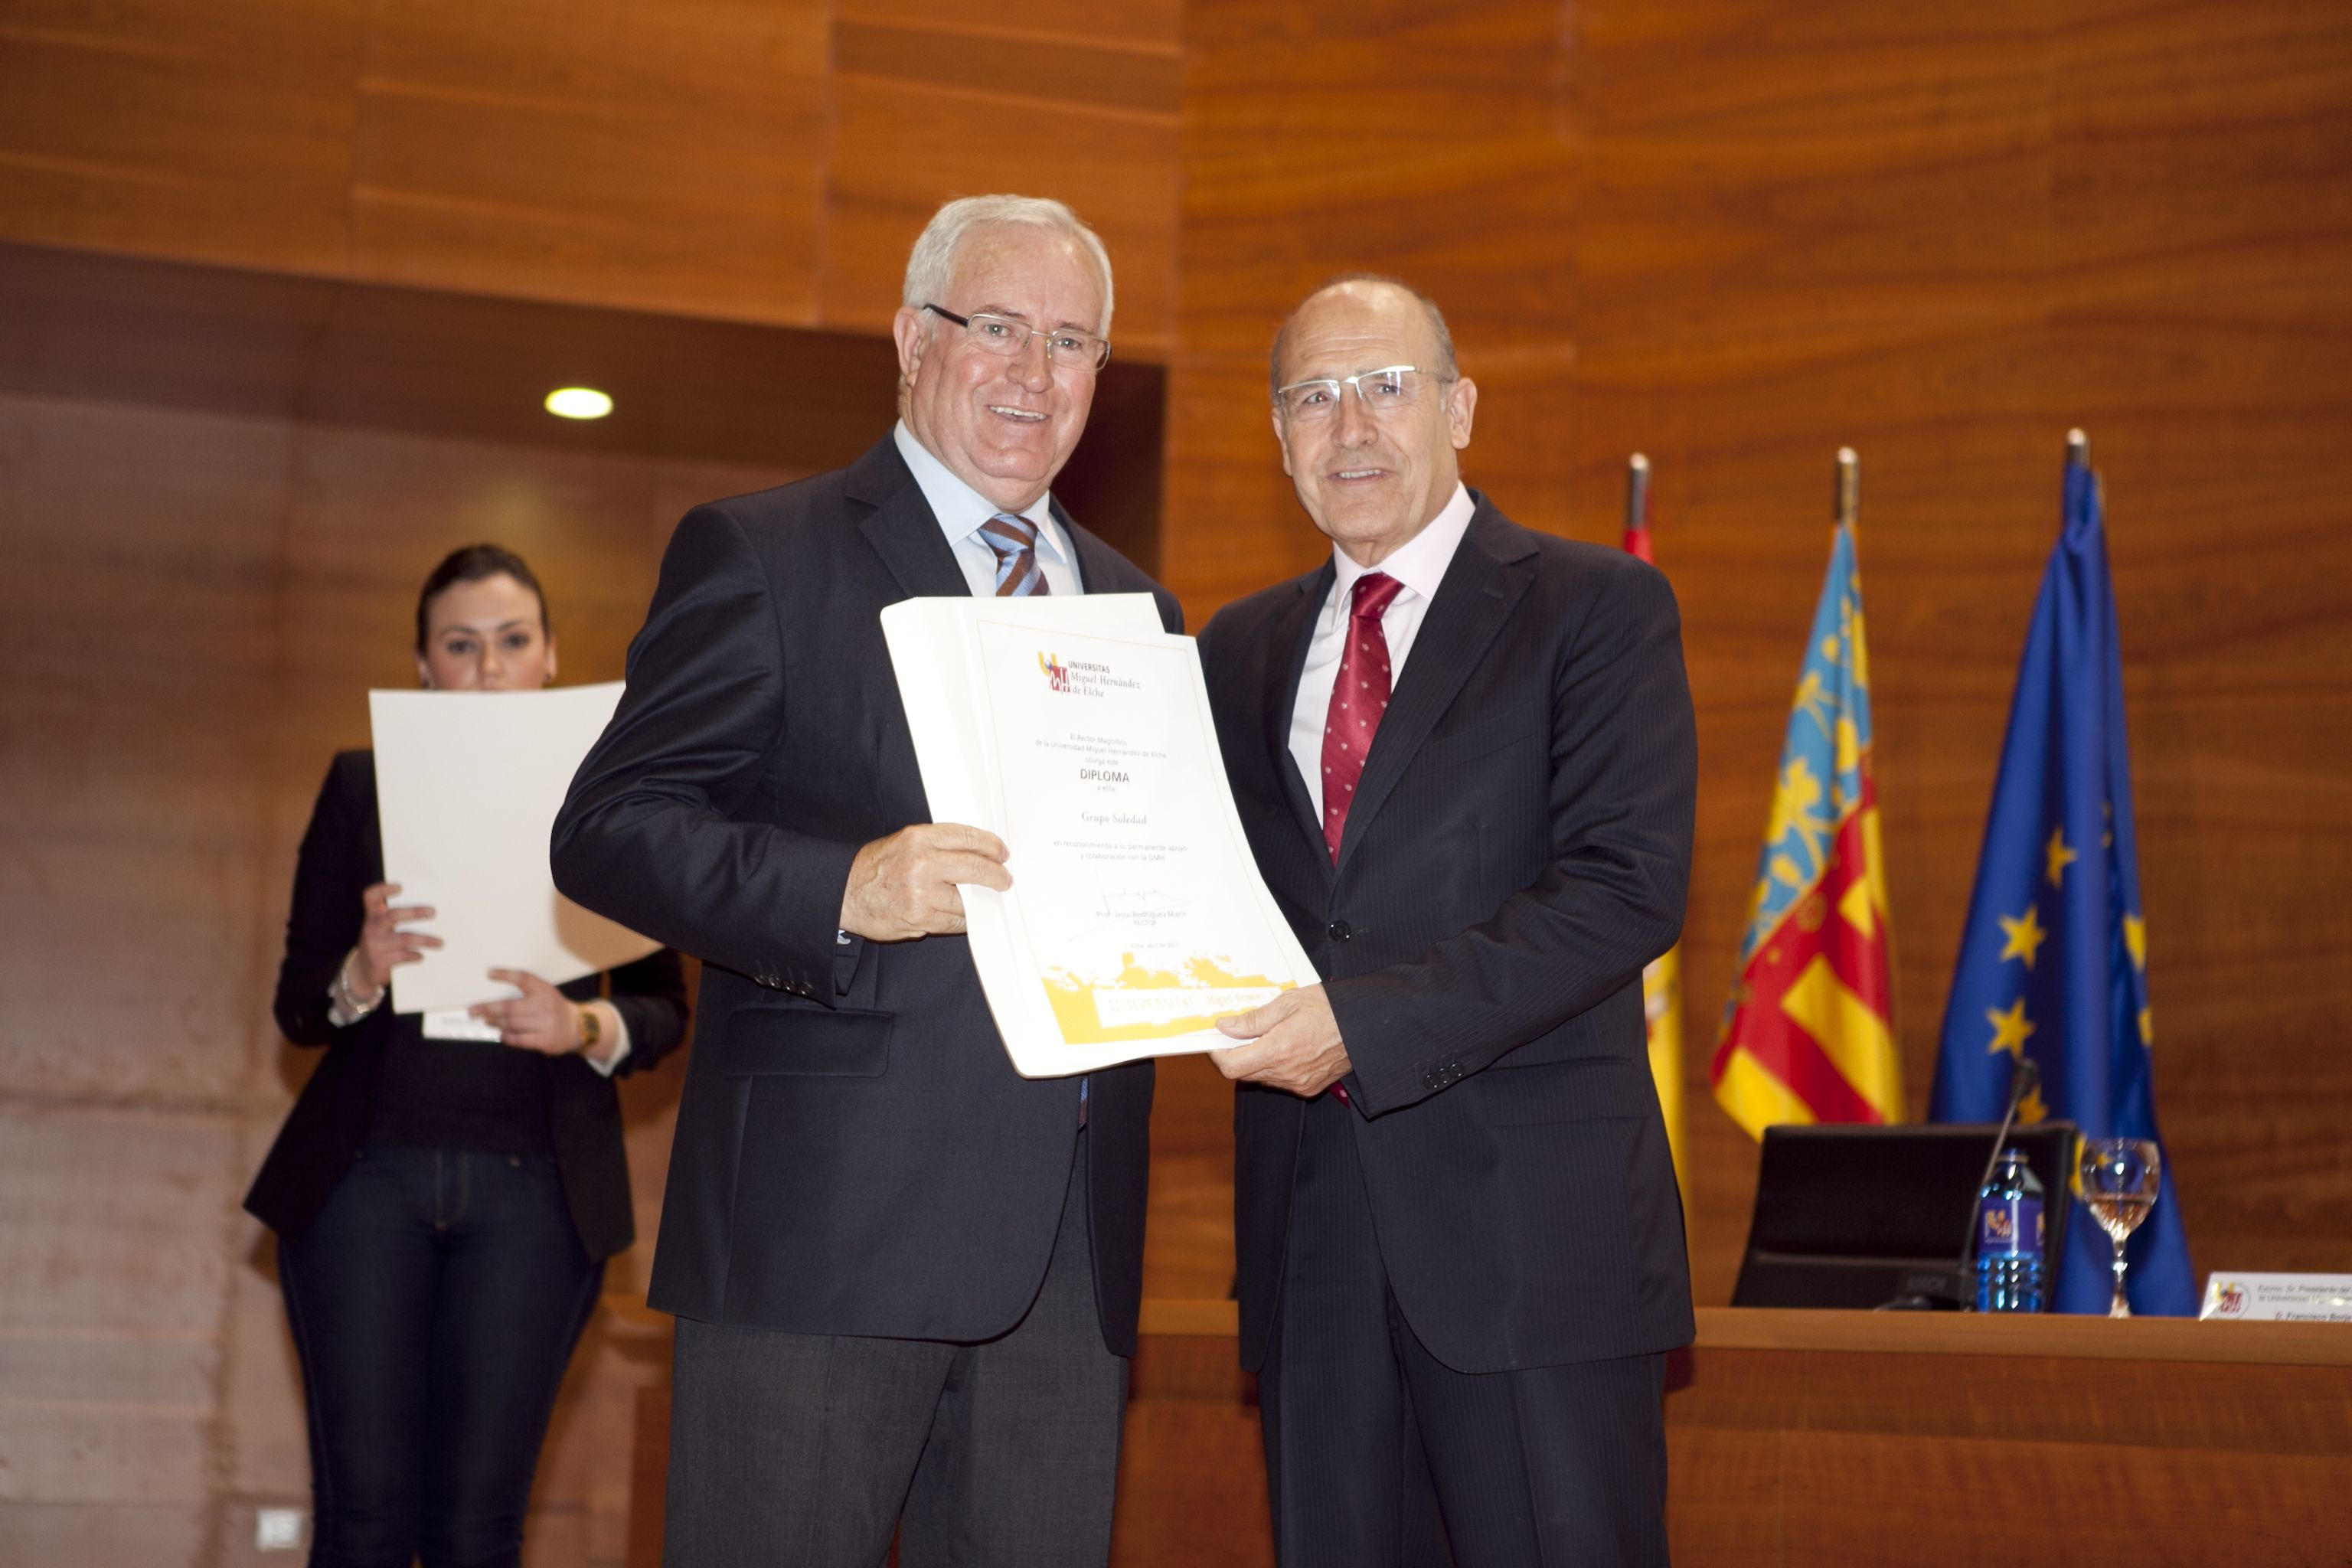 umh-diplomas-rector_mg_6836.jpg